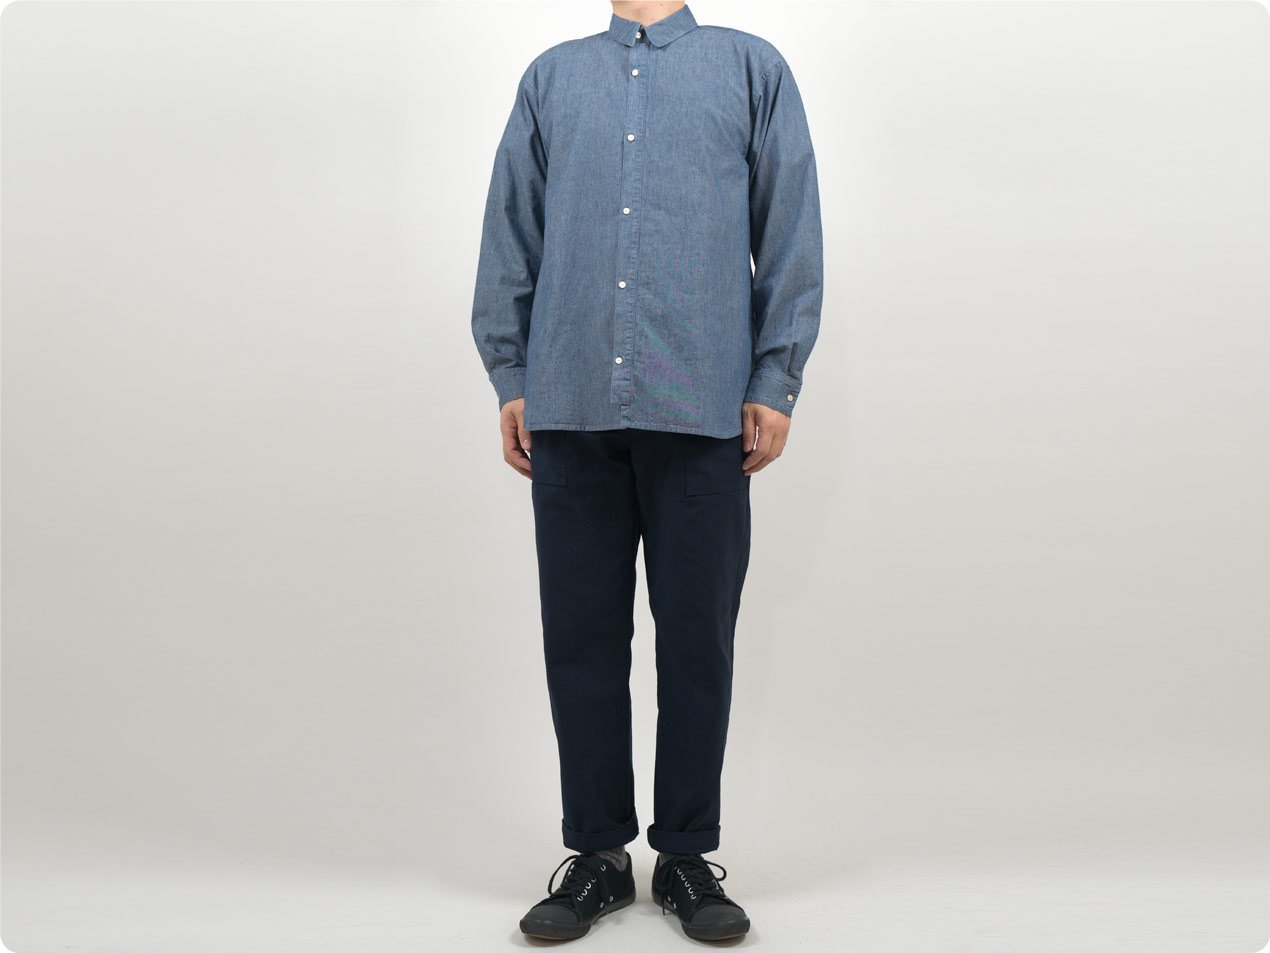 POSTALCO Free Arm Shirt 01 BLUE